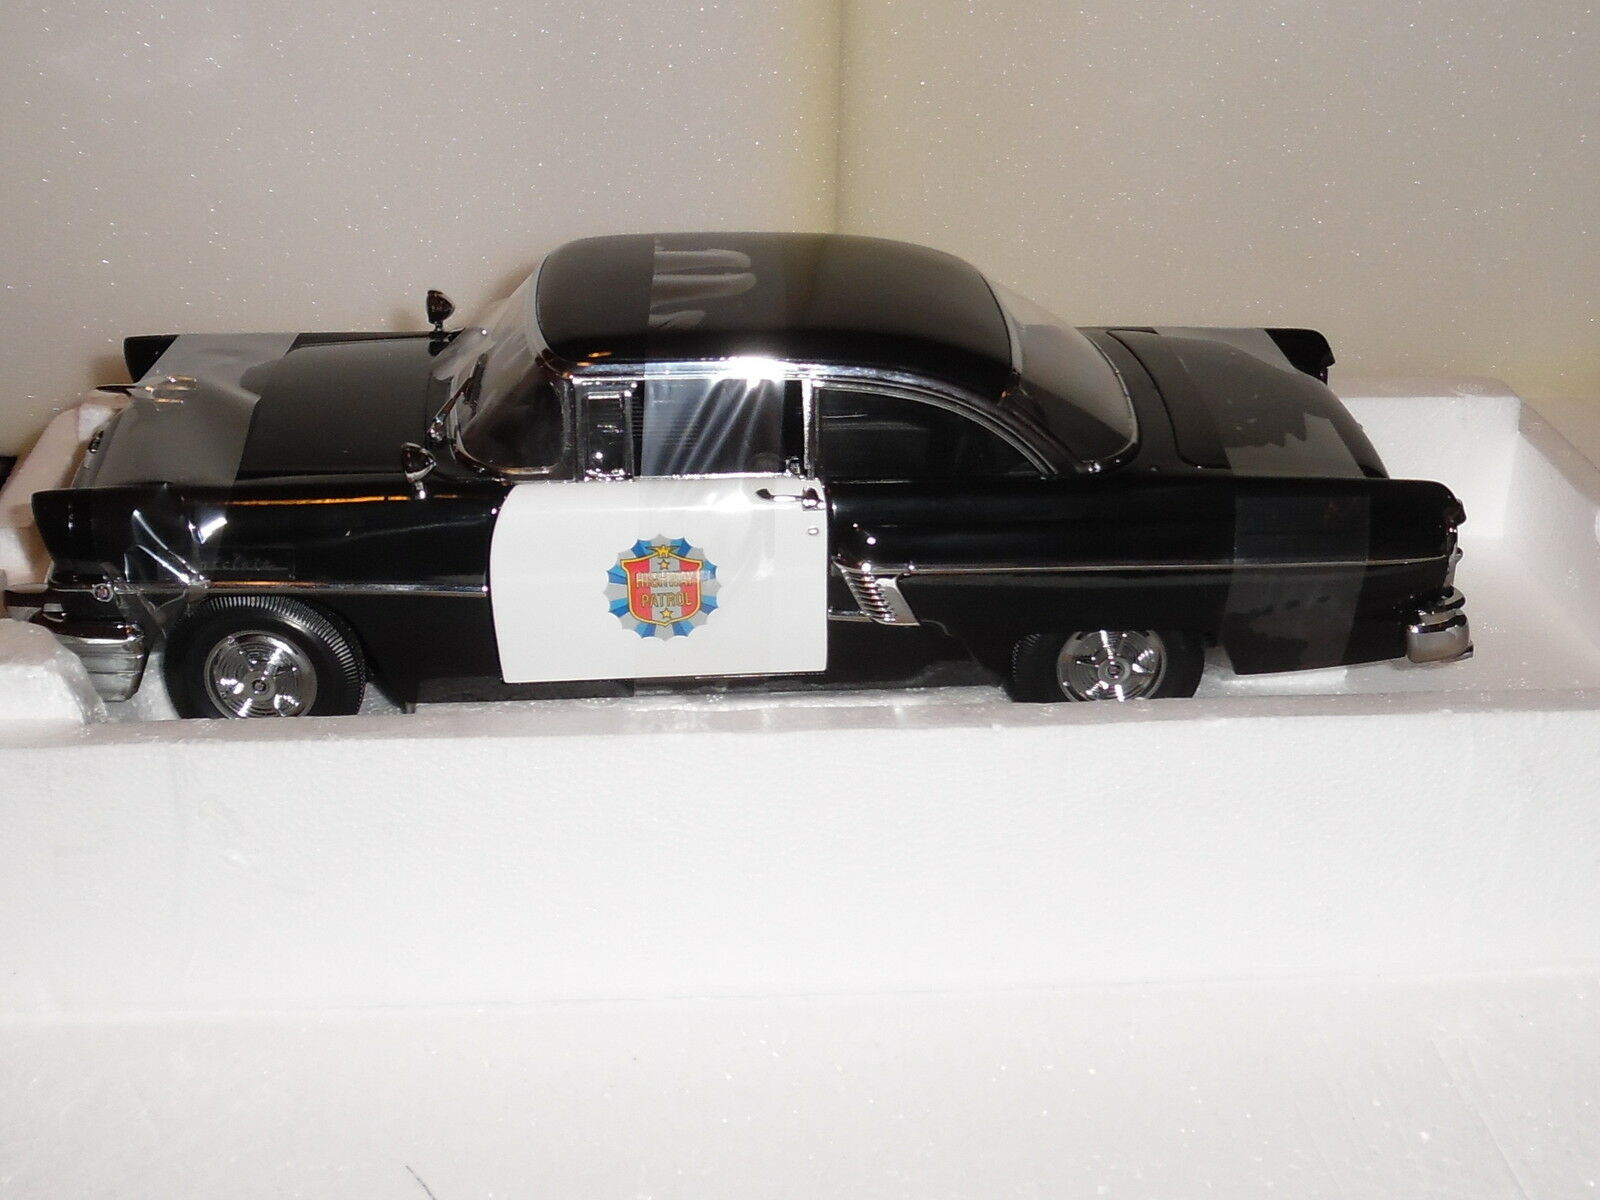 SUN STAR 1 18 SCALE 1956 MERCURY MONTCLAIR POLICE CAR (stunning looking)